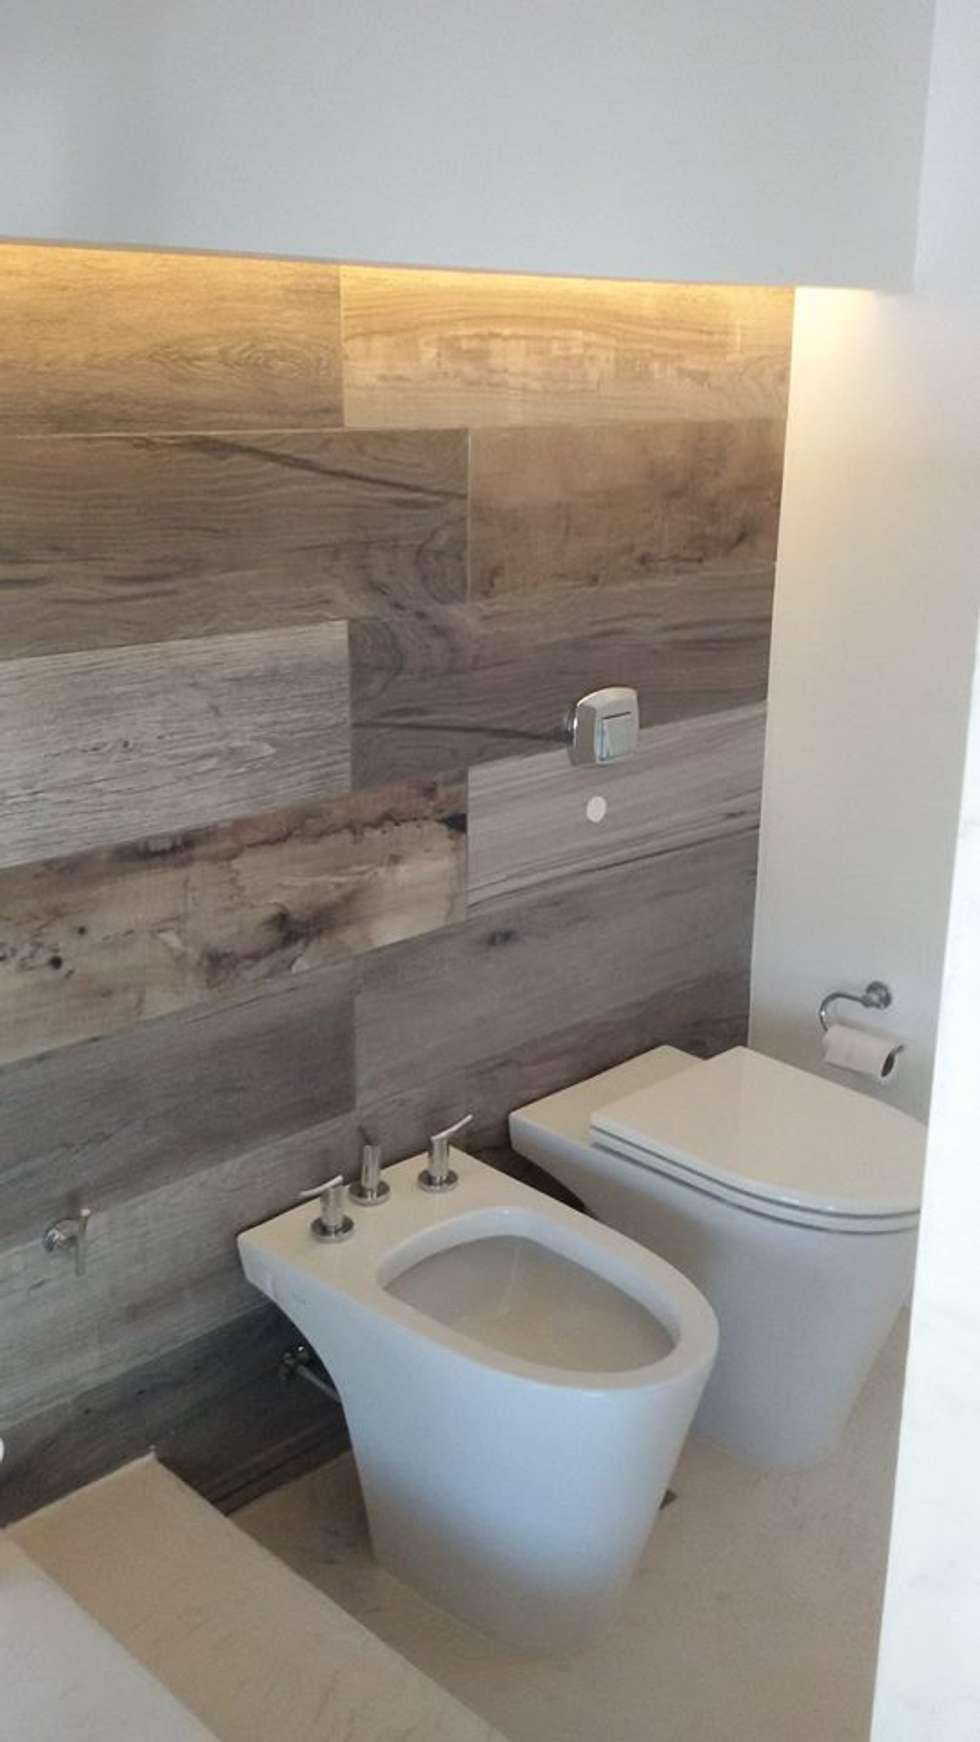 Baño Secotrizado: Baños de estilo moderno por Estudio A+I